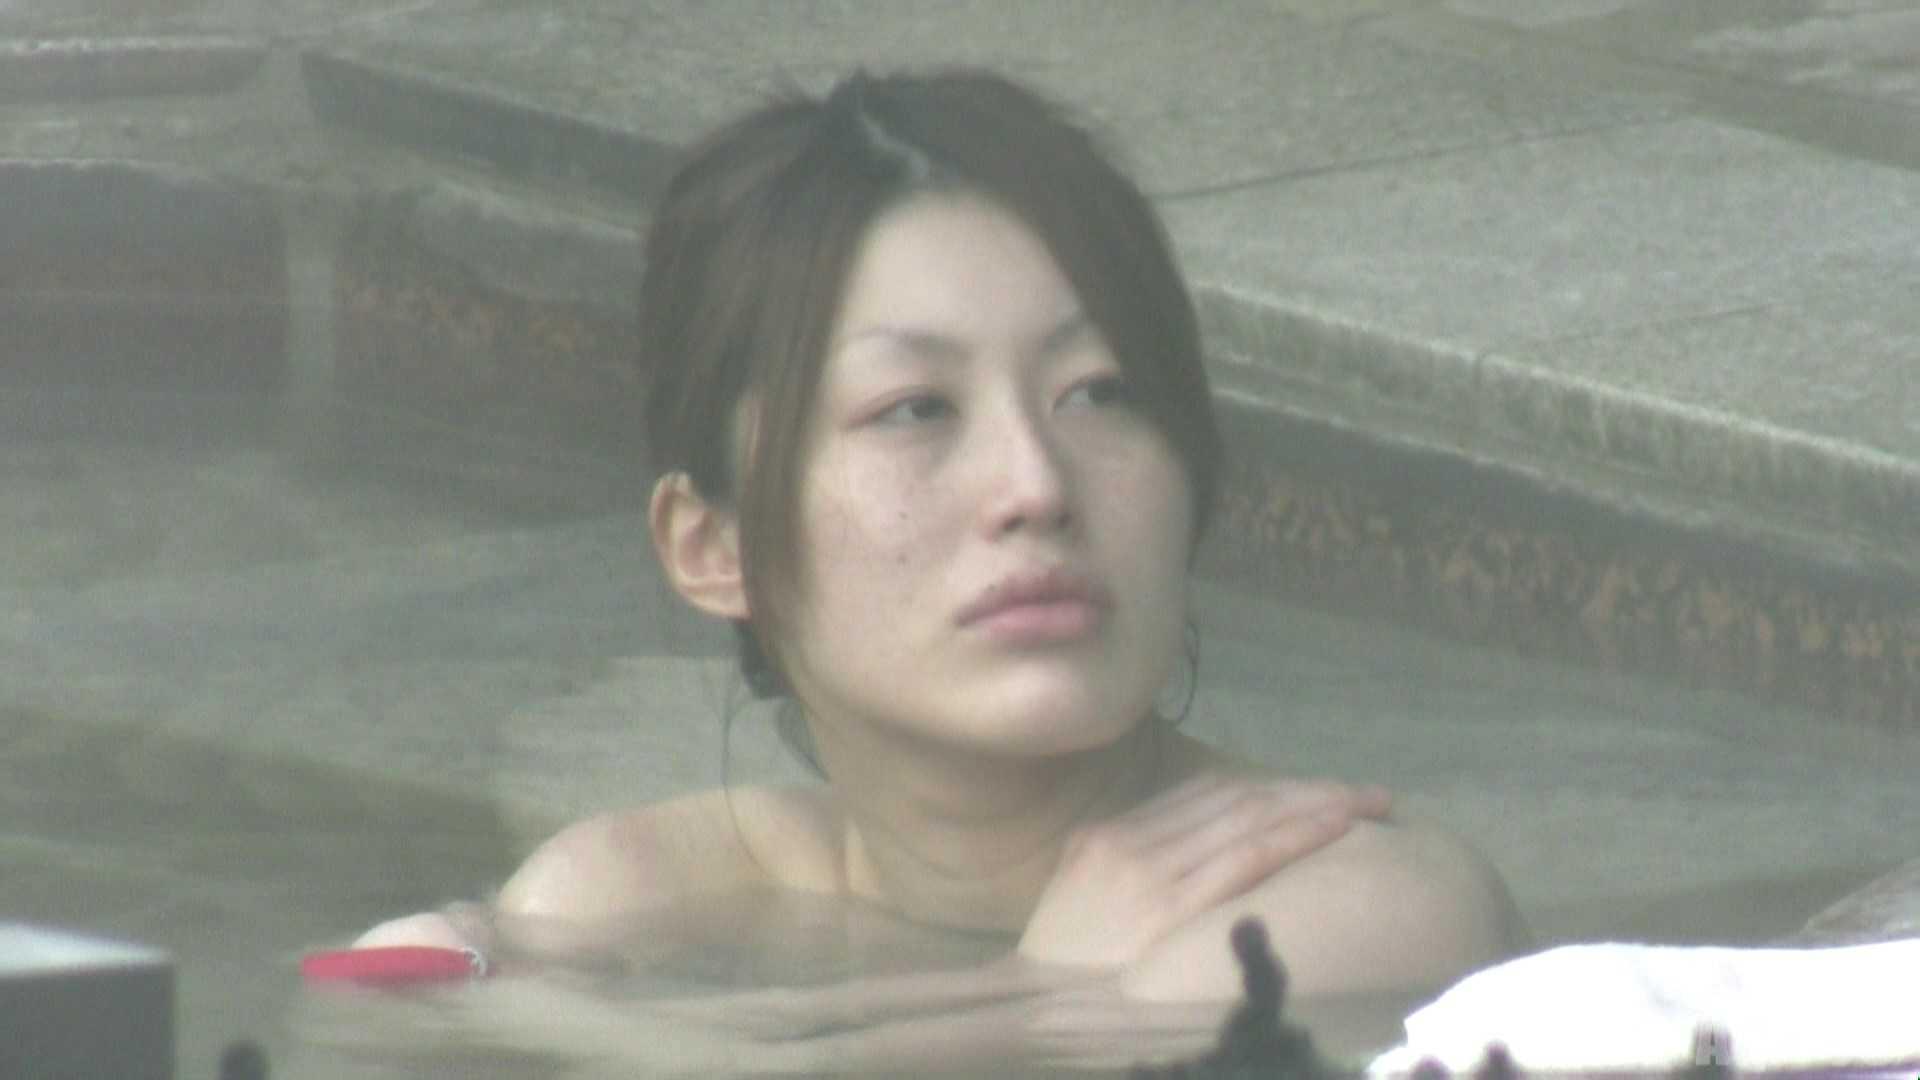 Aquaな露天風呂Vol.775 盗撮映像  74Pix 24